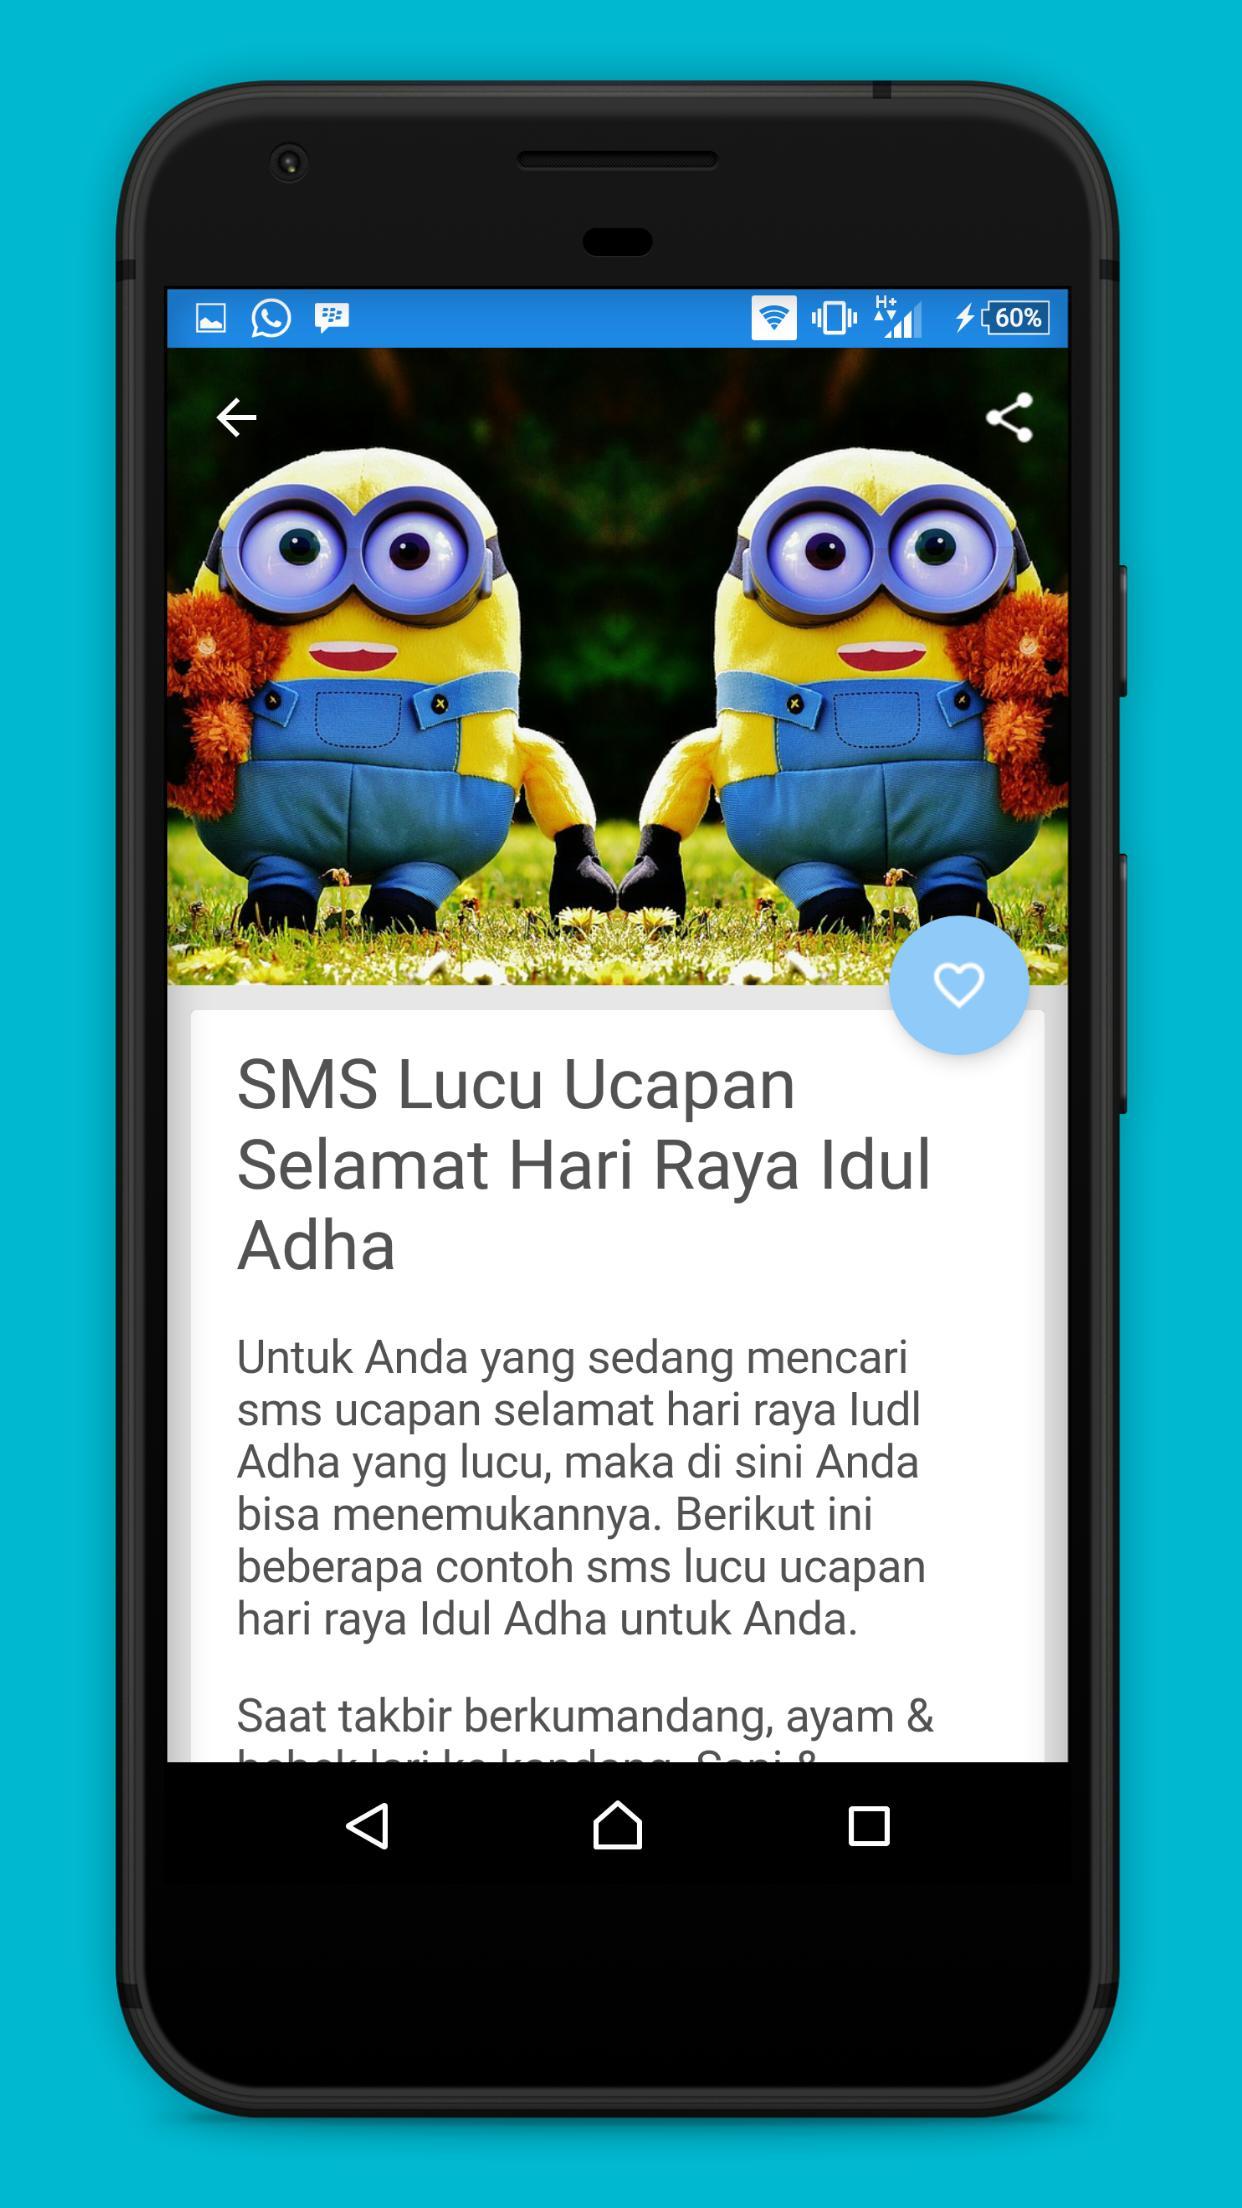 Ucapan Selamat Idul Adha 2017 Para Android APK Baixar